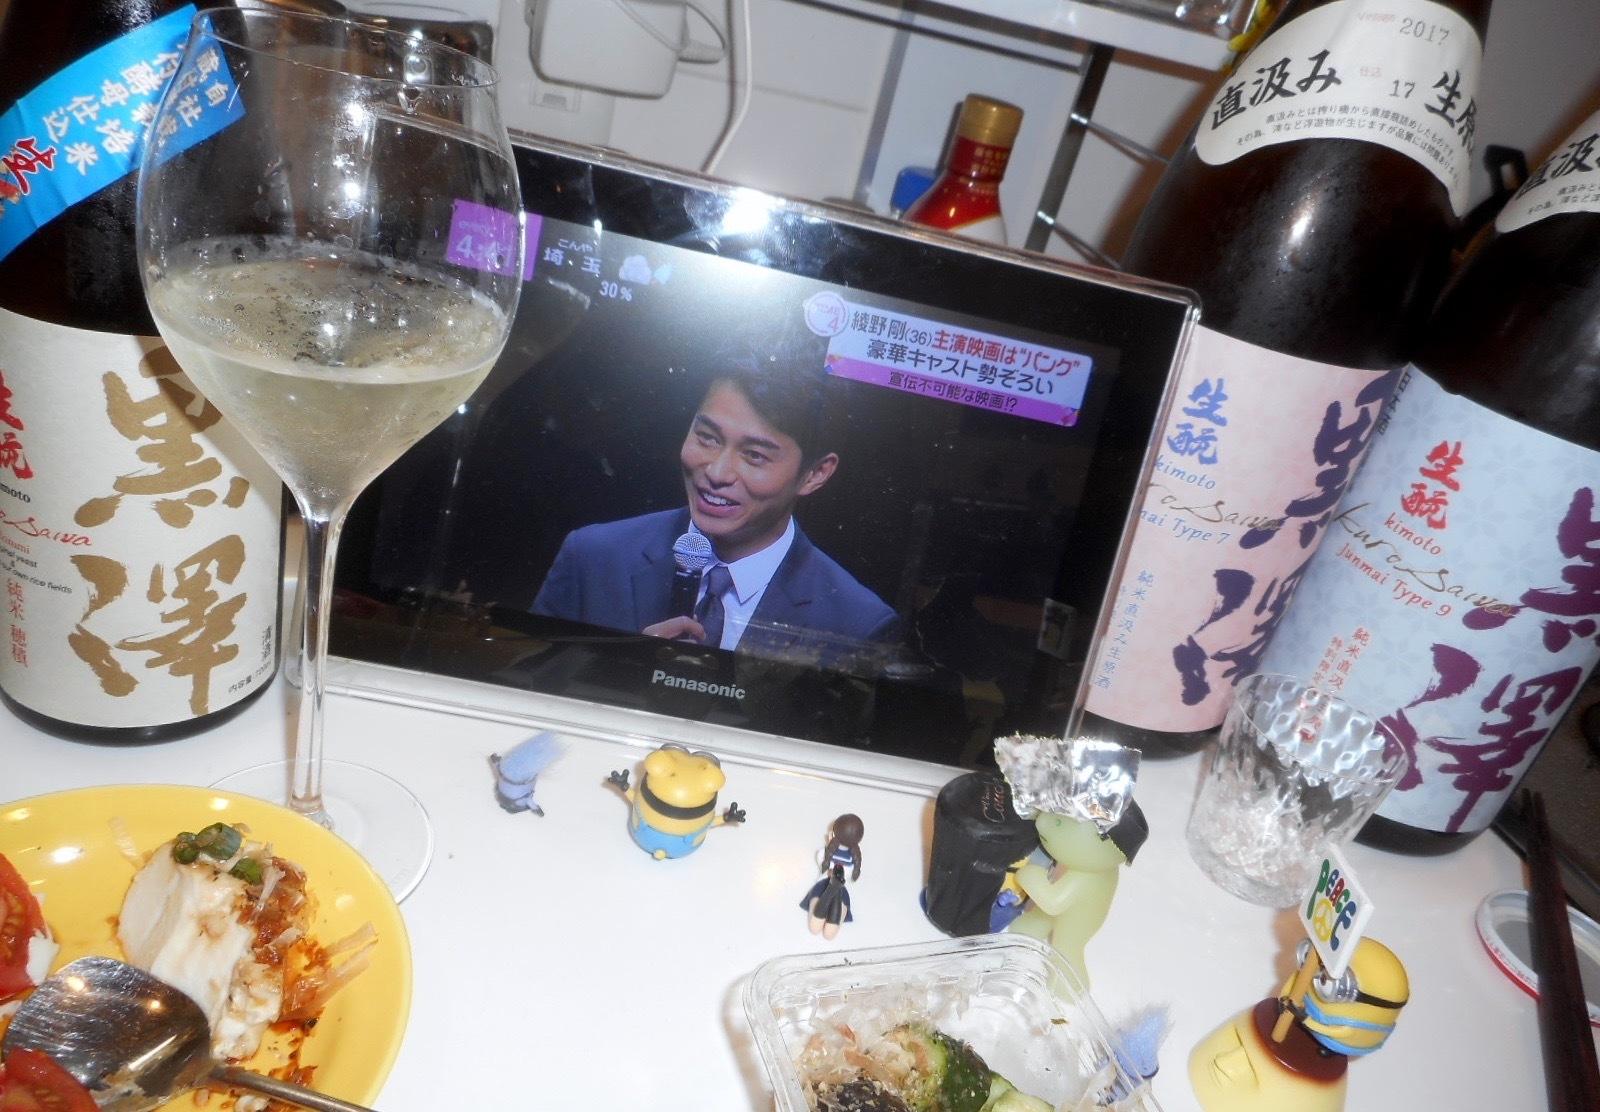 kurosawa_hozumi29by7.jpg